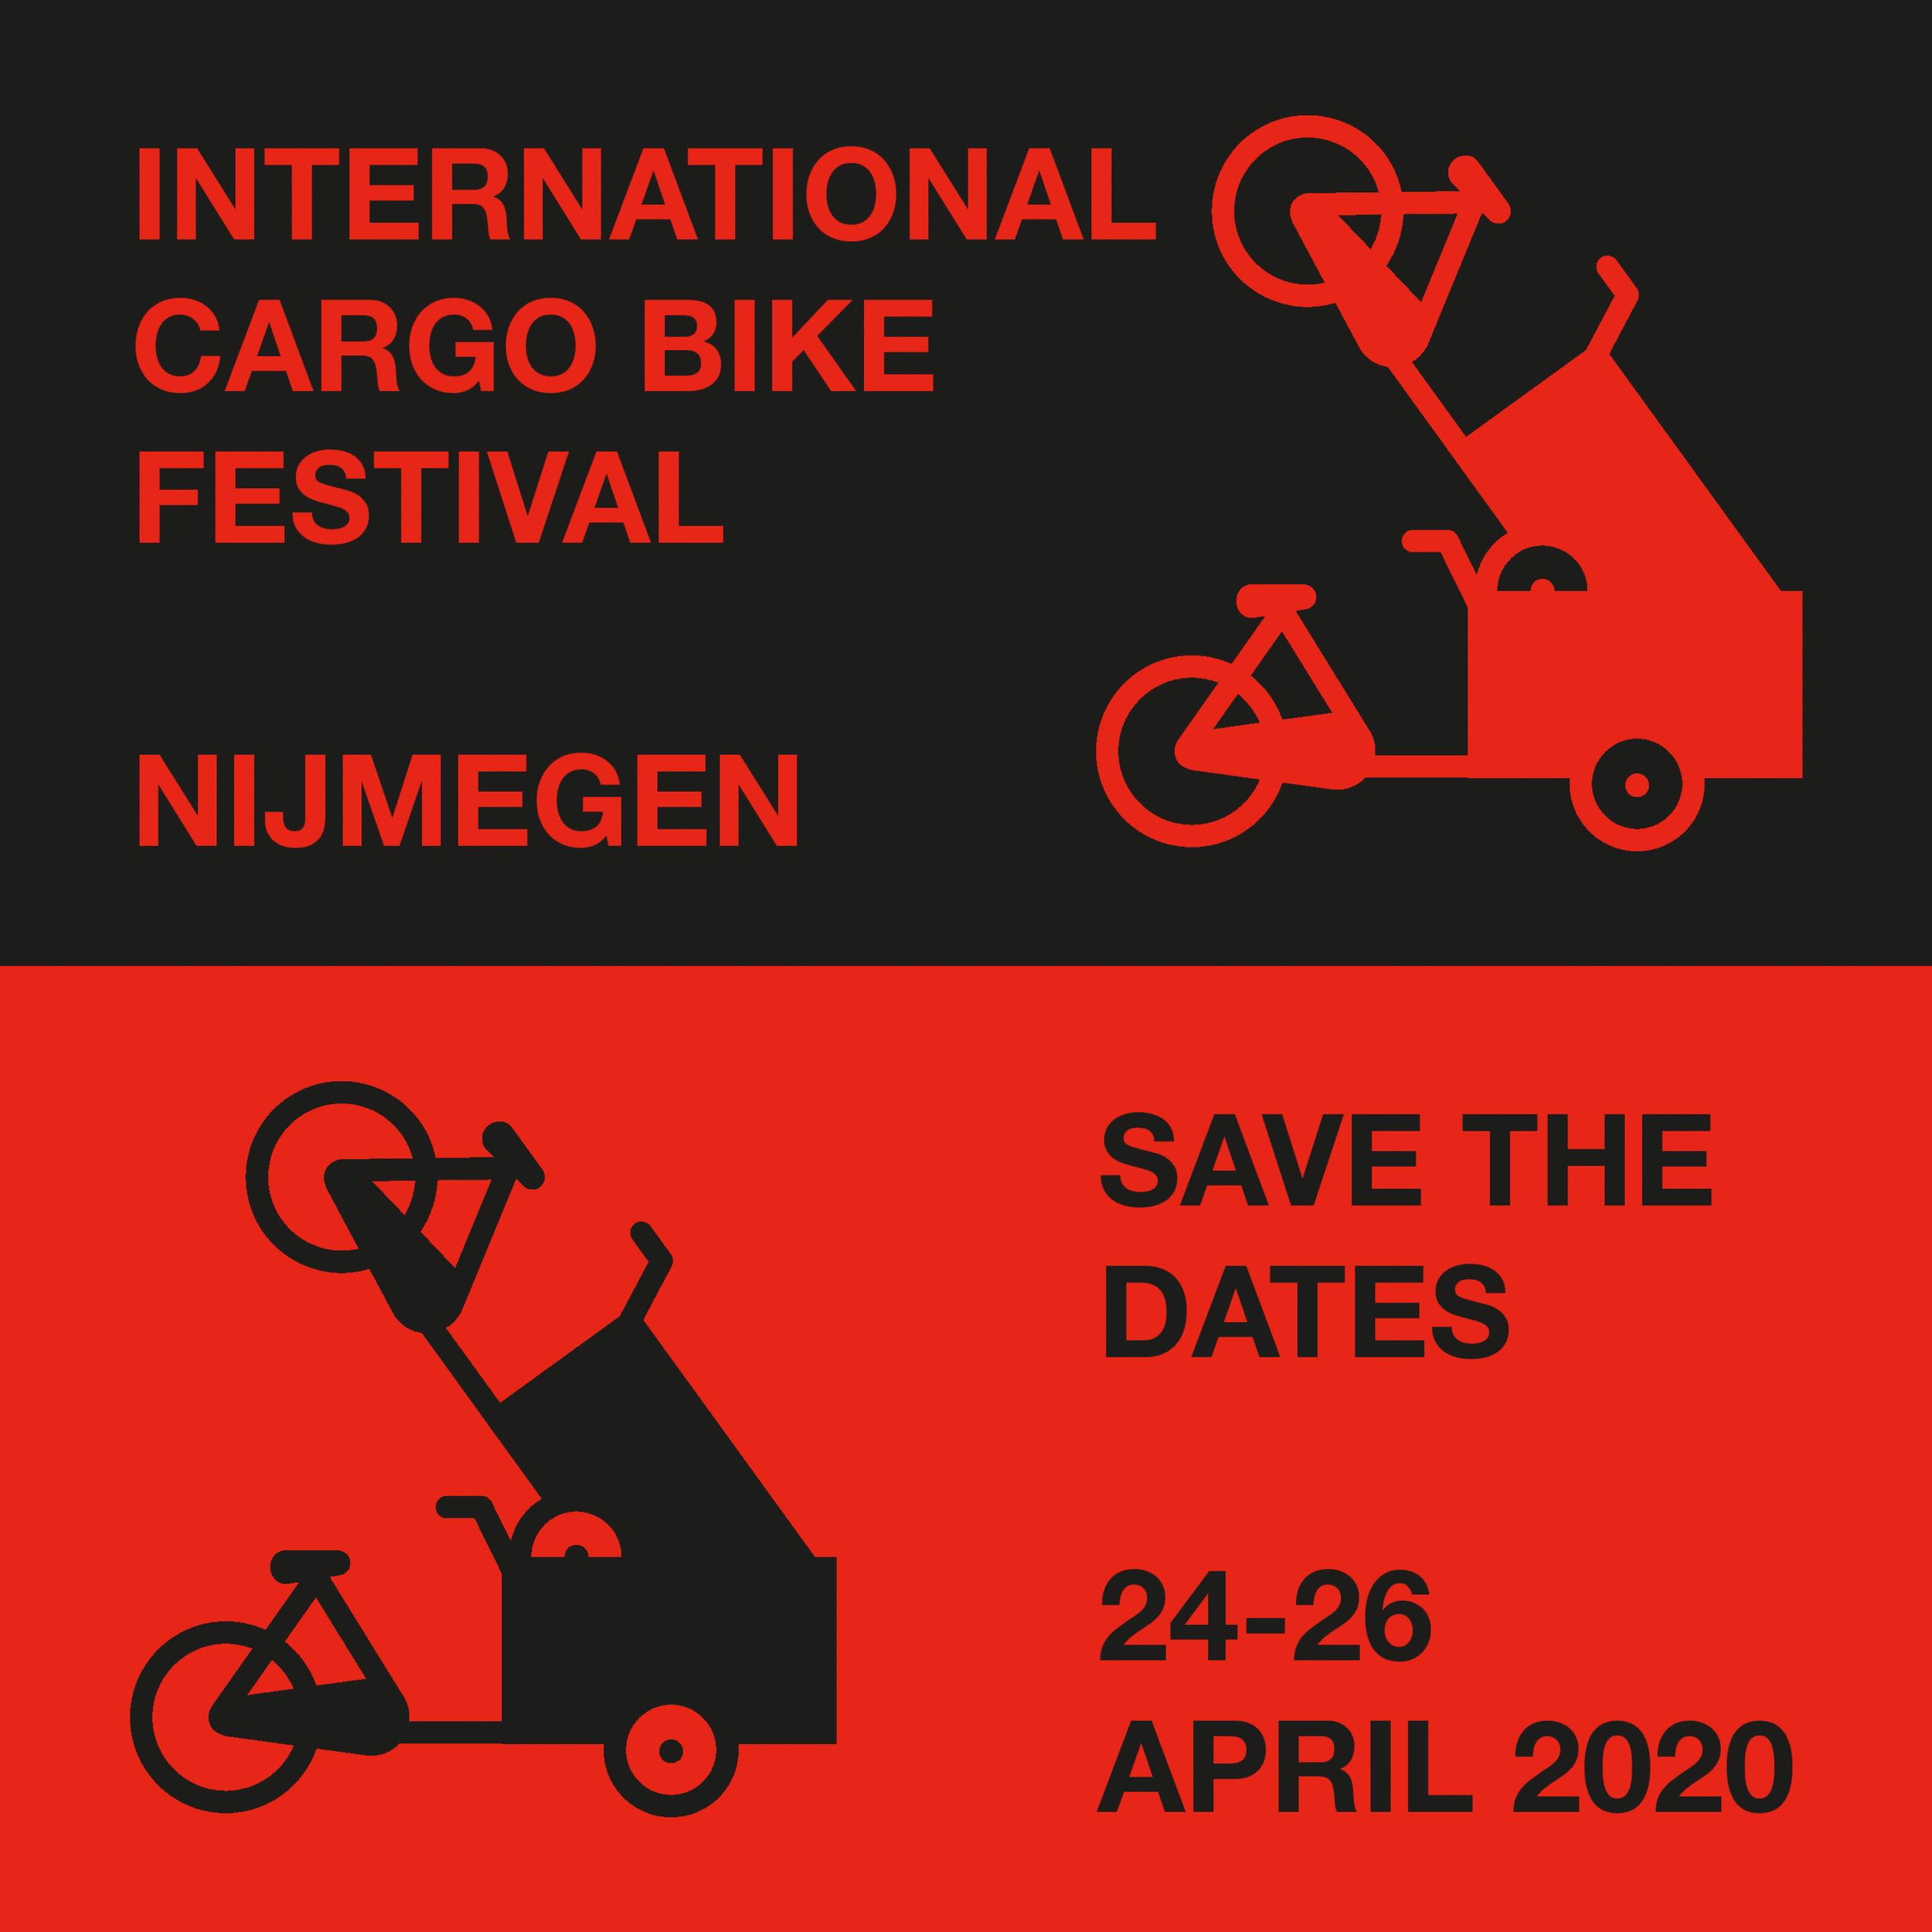 International Cargo Bike Festival